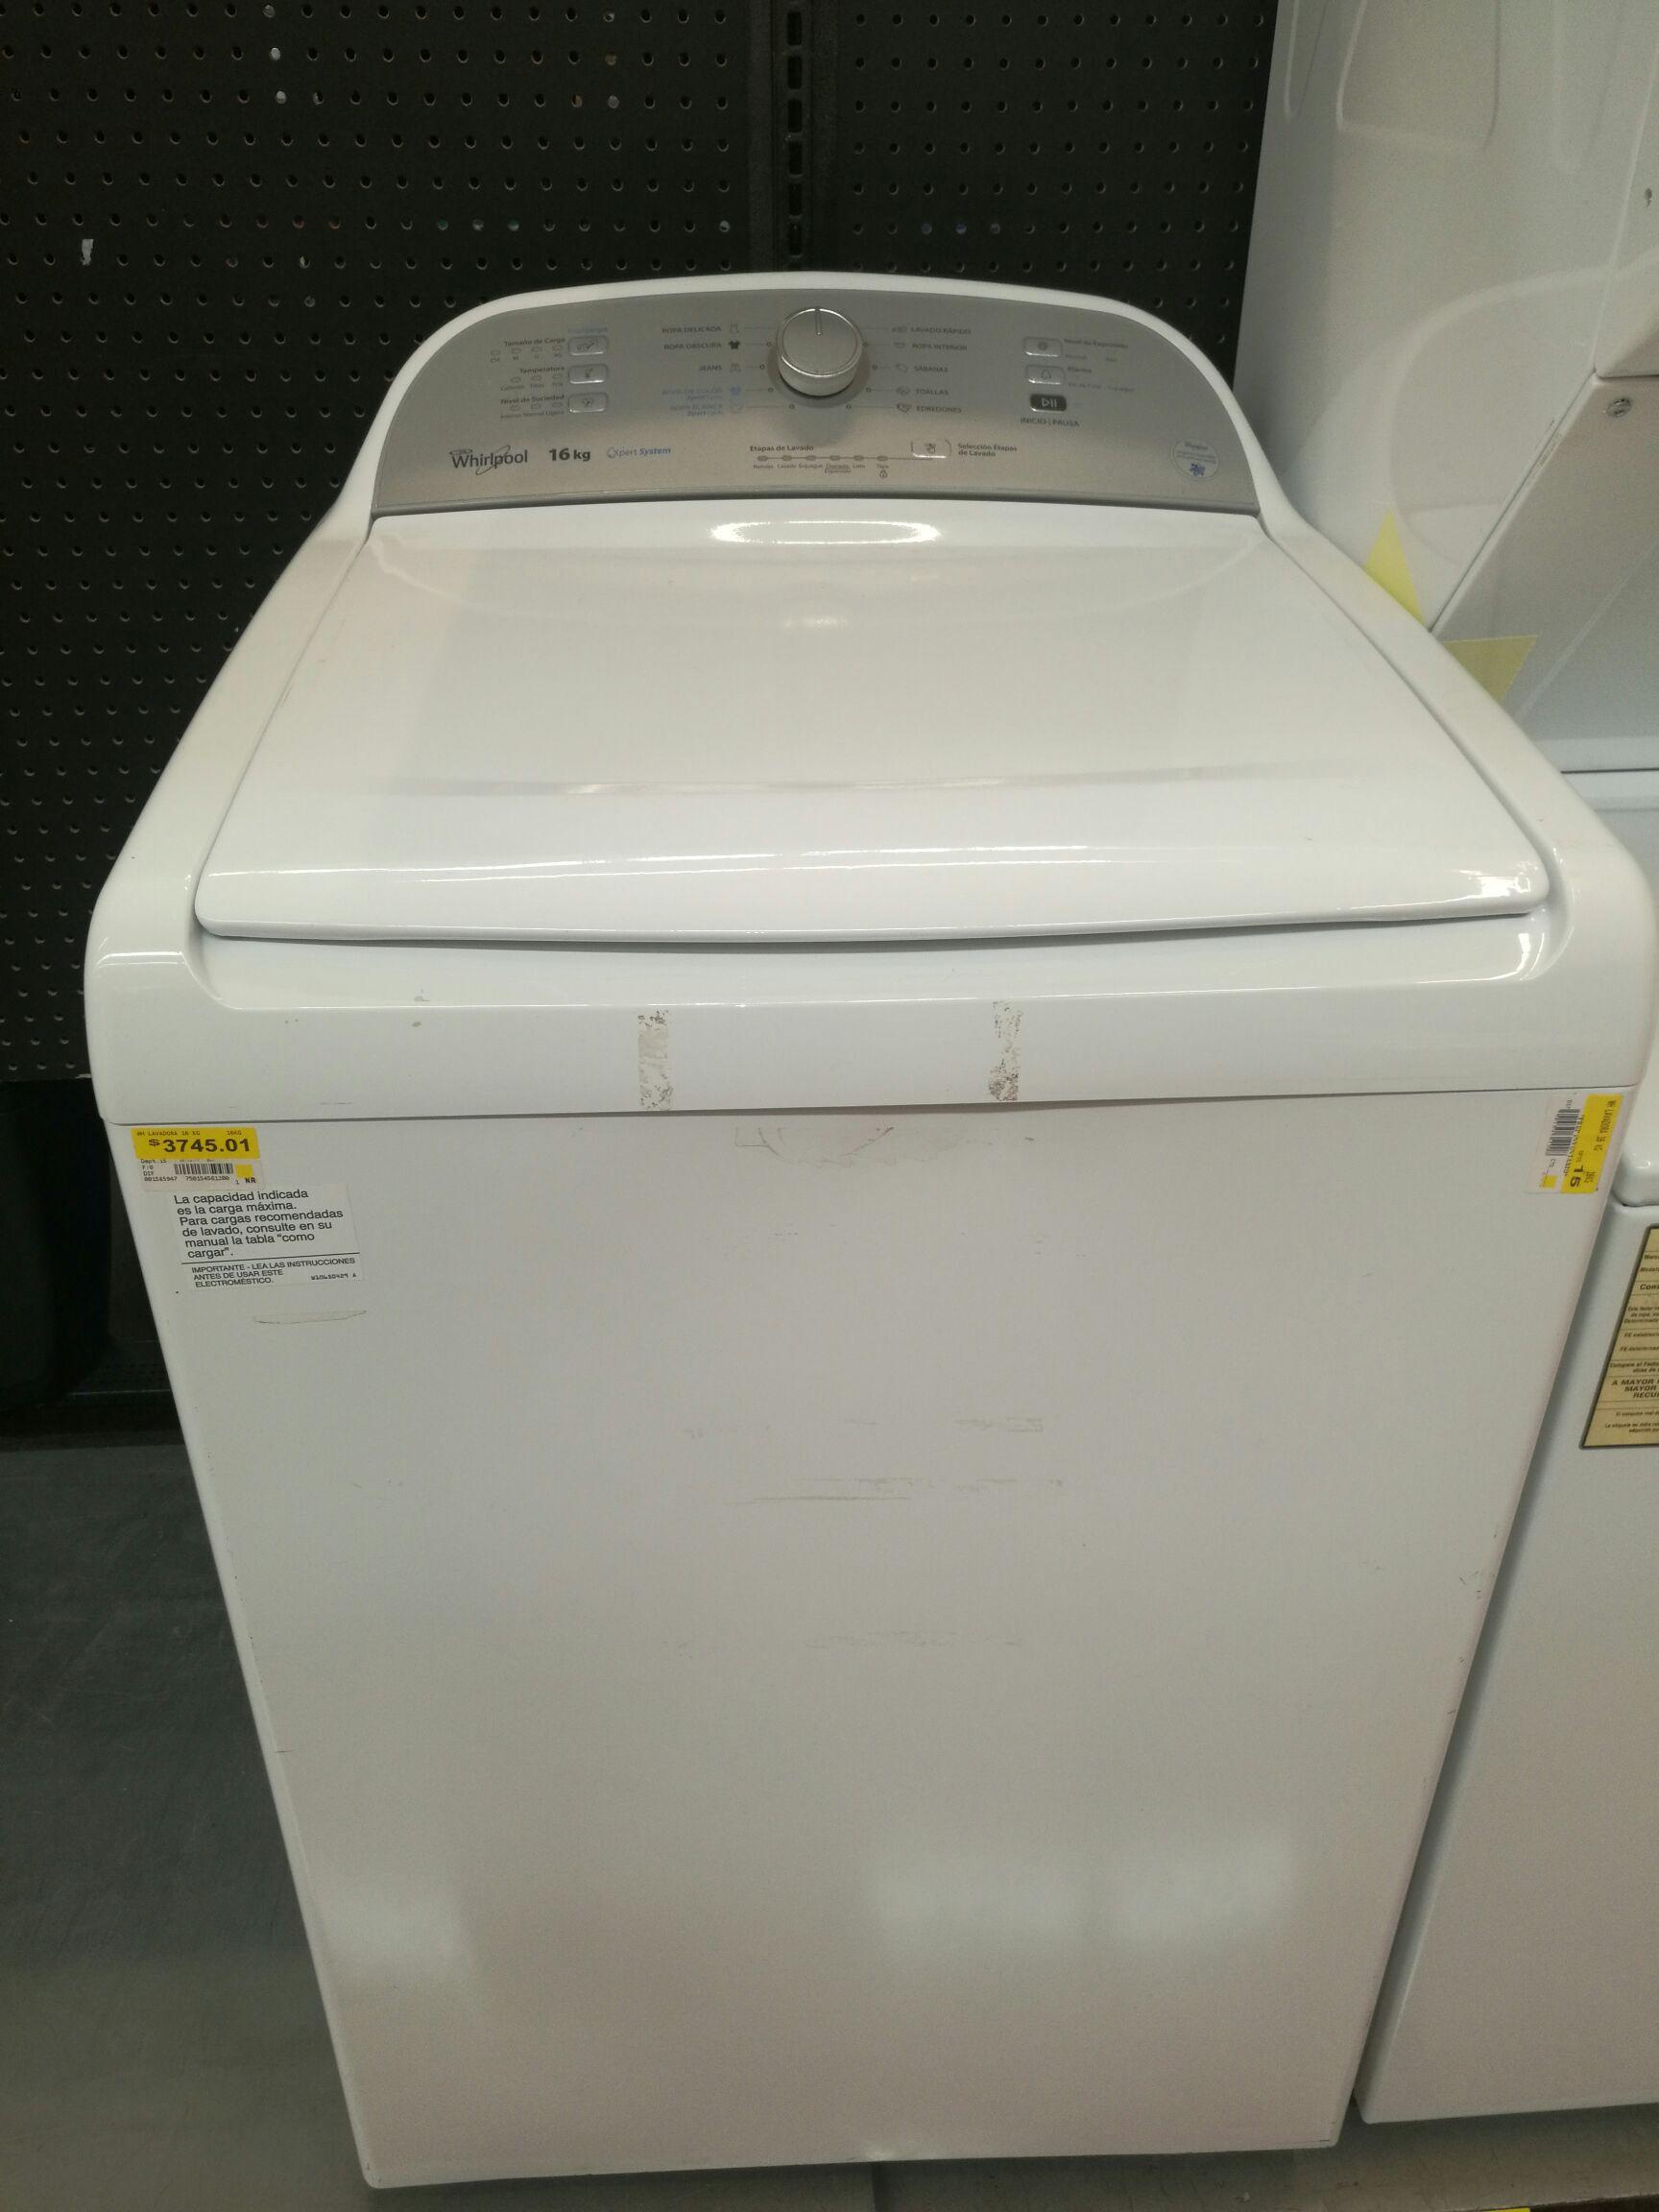 Walmart Pensiones: lavadora Whirlpool 16 kg a $3,745.01